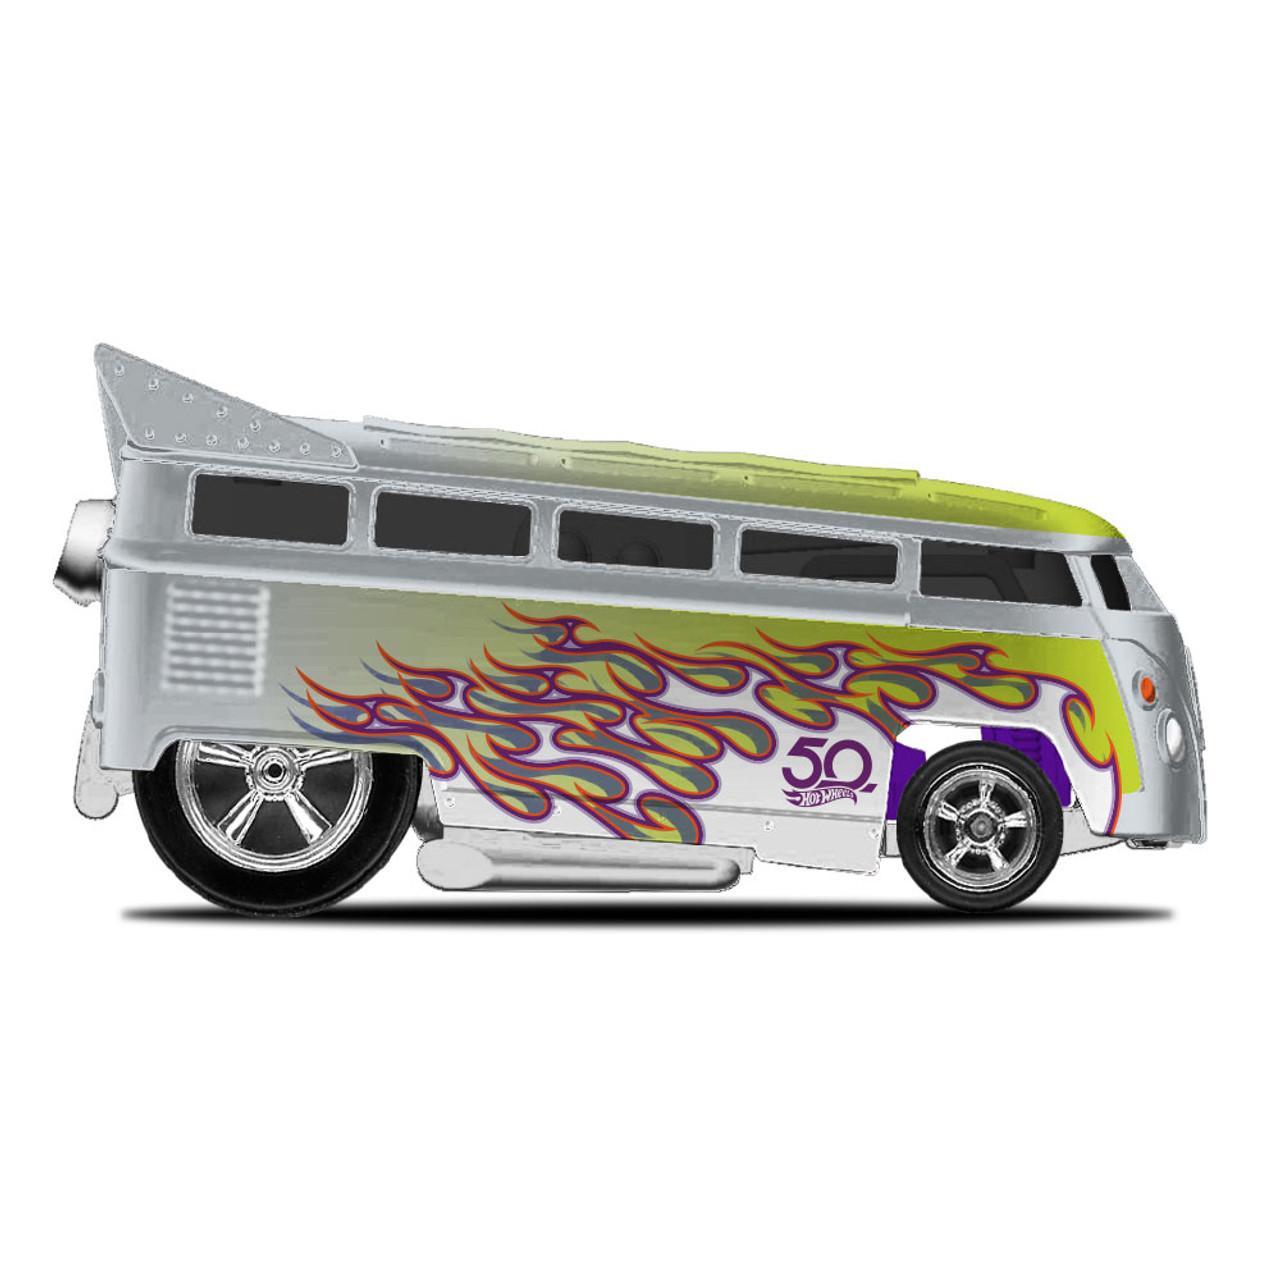 Hot Wheels 50th anniversary Favorites Real Riders VW T1 Drag Bus 1:64 Hot Wheels